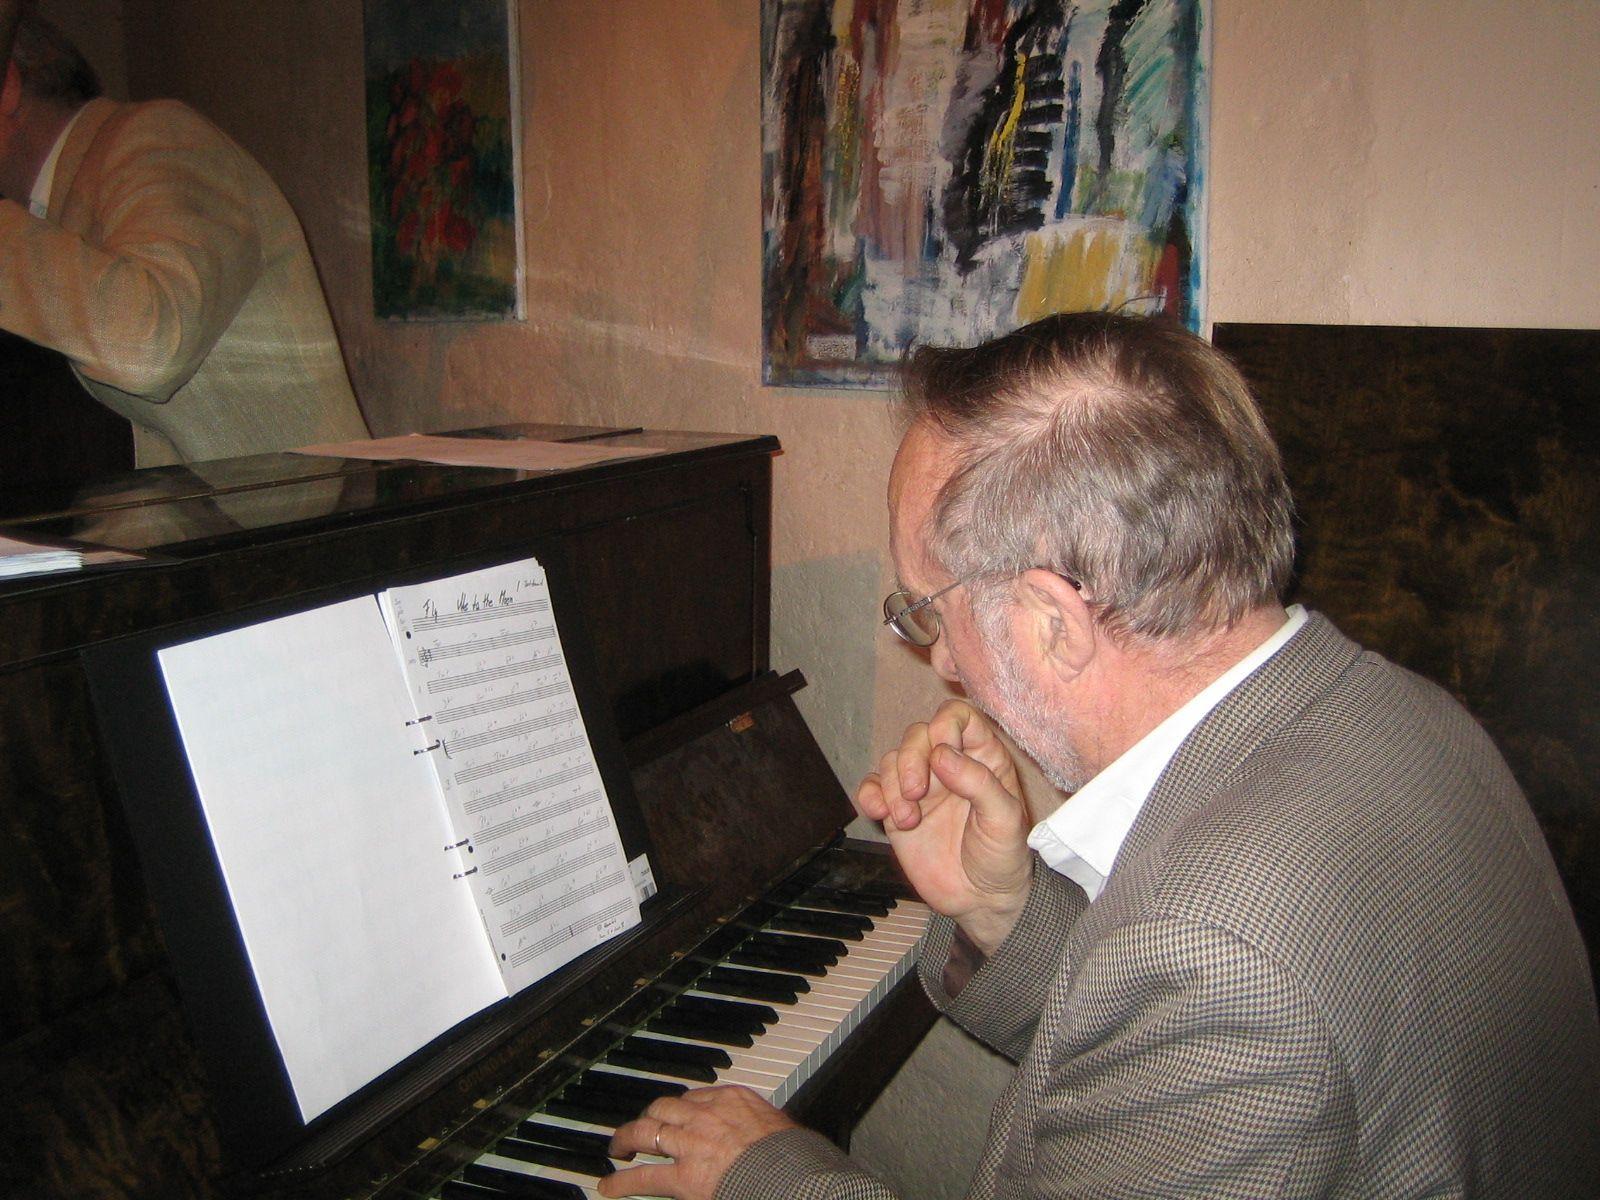 Janne Sjöblom - Piano Photo: Hans Jung http://www.opusnorden.com/se/jazzsv/rfquartet/jansjoblom